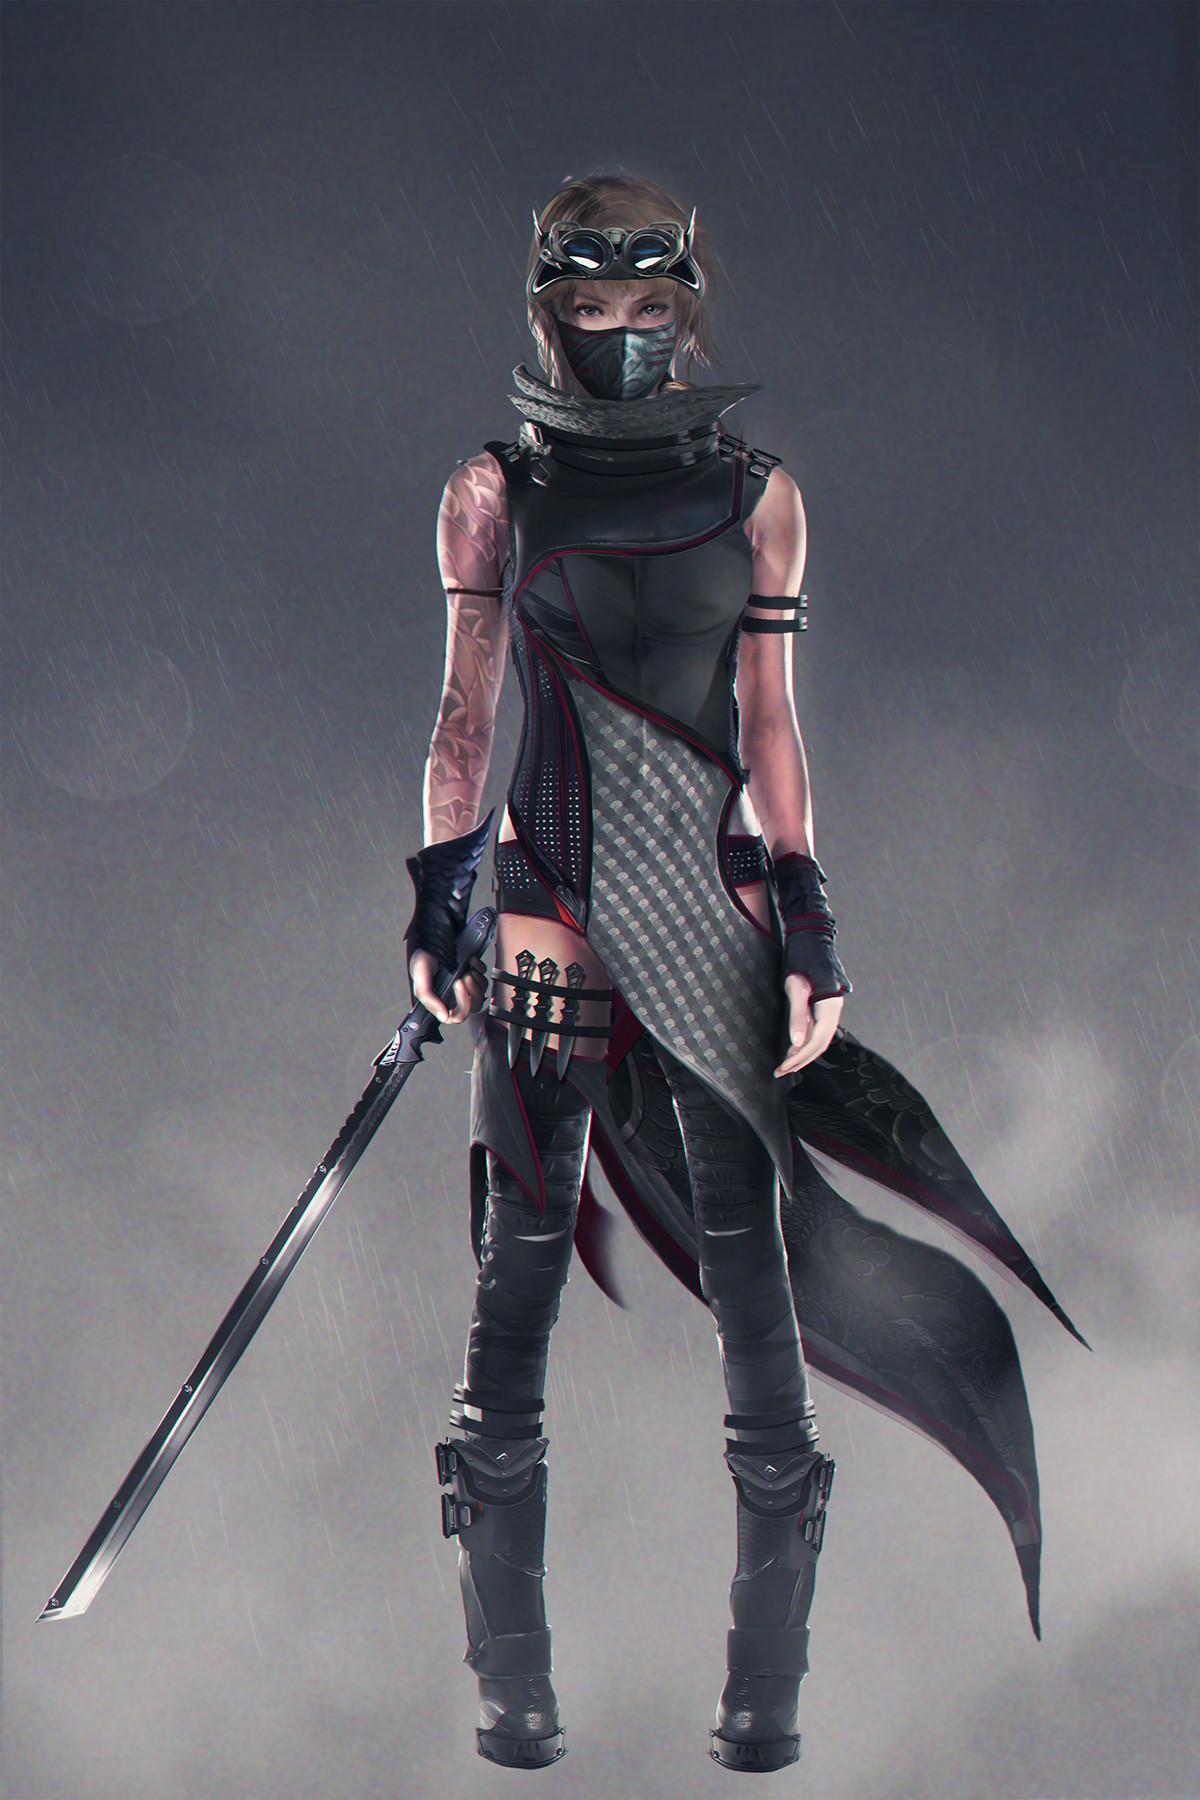 Ninja version